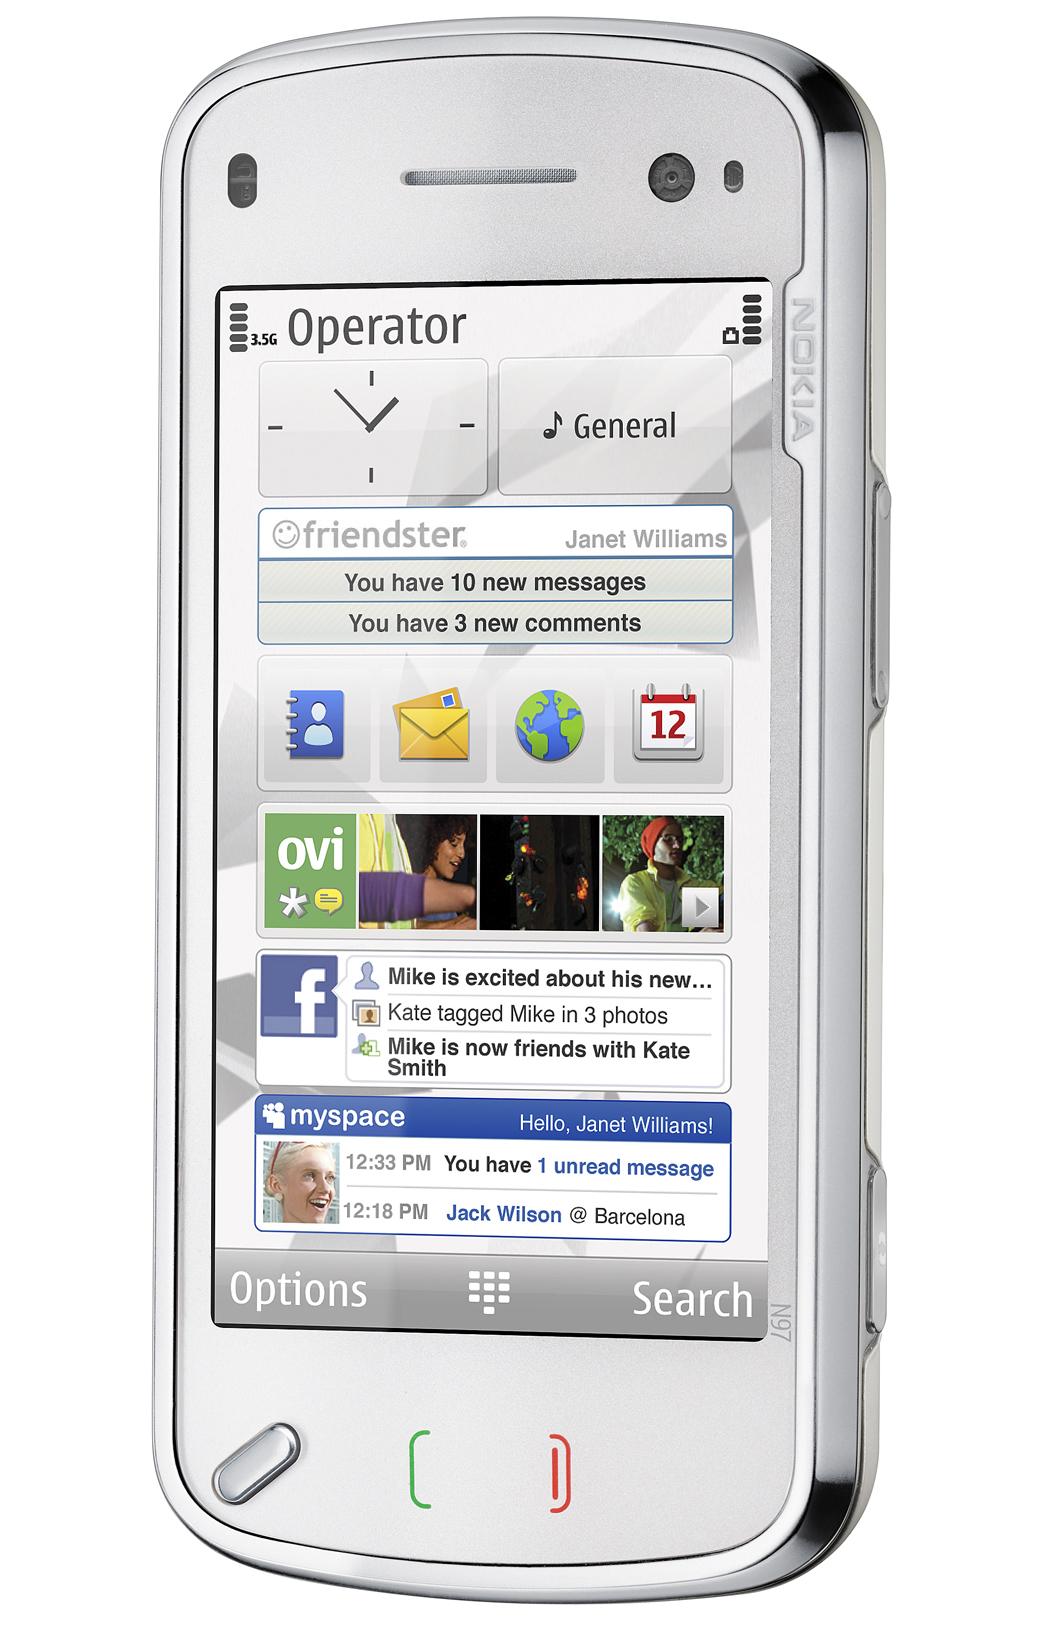 Nokia N97 kommer på markedet til sommeren, men har neppe den nye, trådløse strømoverføringen om bord.